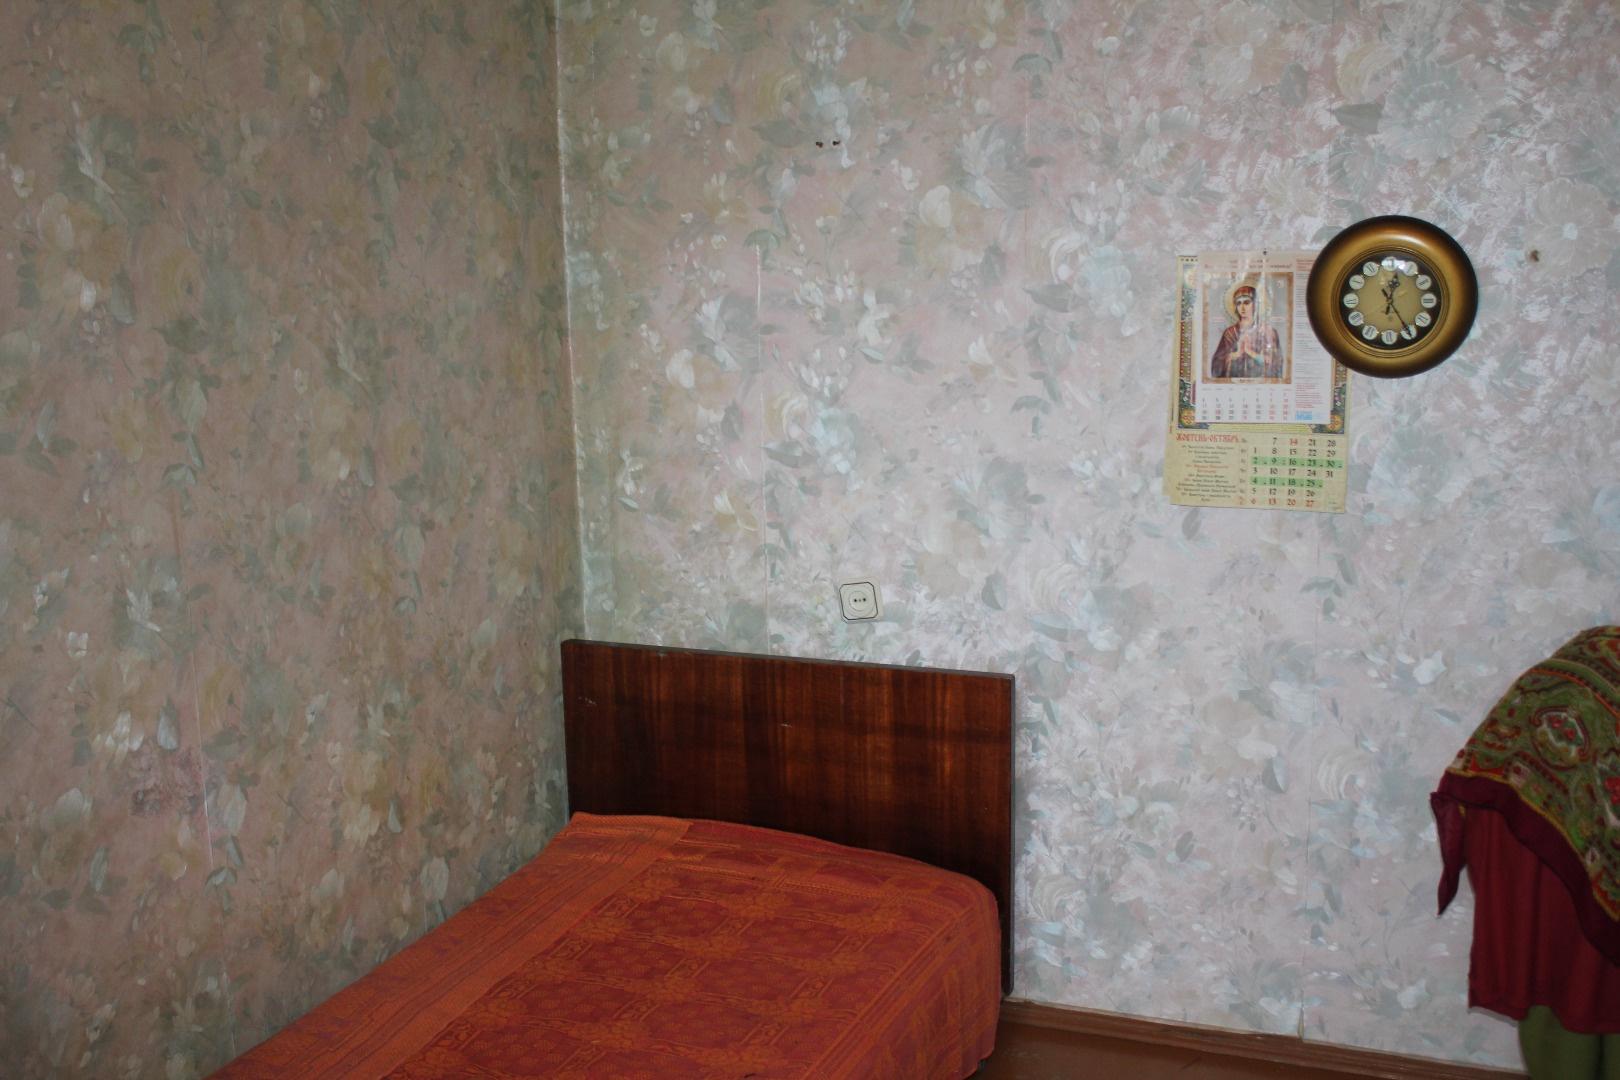 Продается 4-комнатная Квартира на ул. Спортивная (Гайдара) — 53 000 у.е. (фото №6)